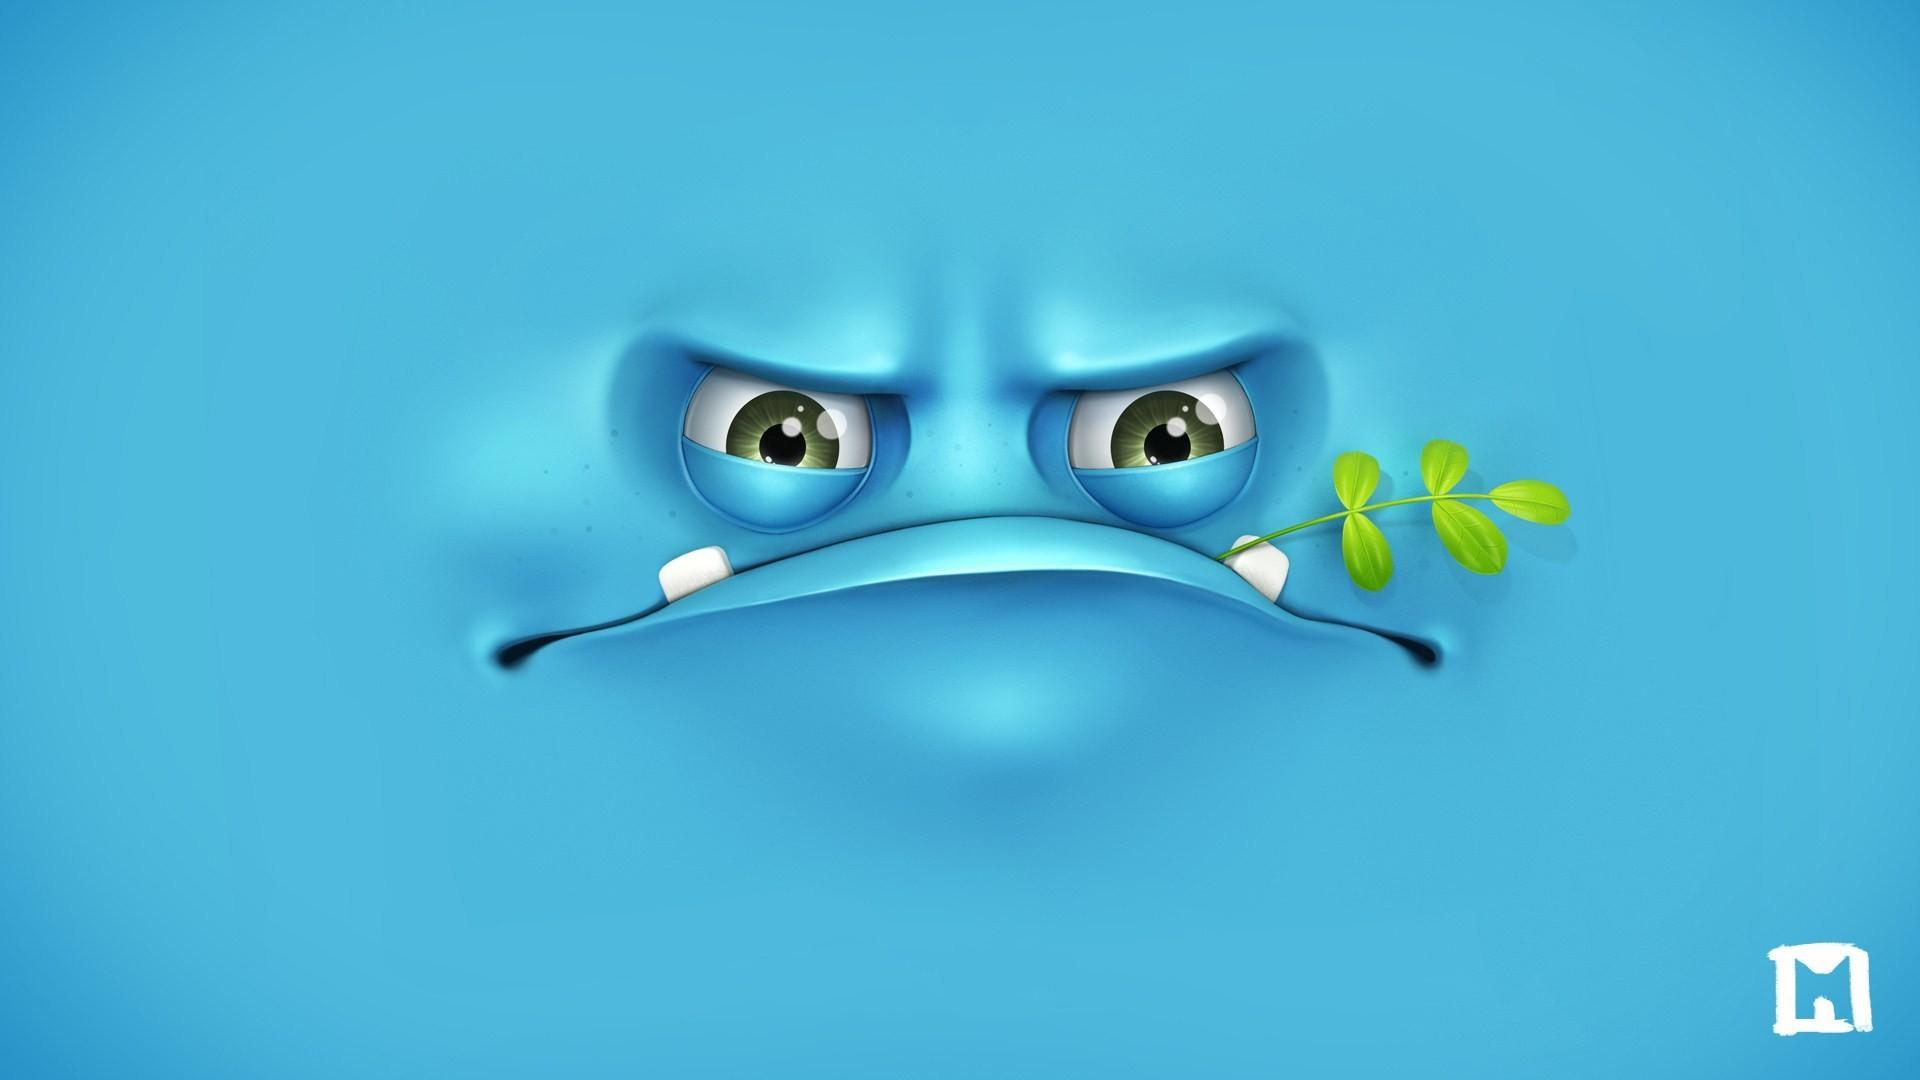 Funny 3d Desktop Wallpaper Funny-3d-background – cool